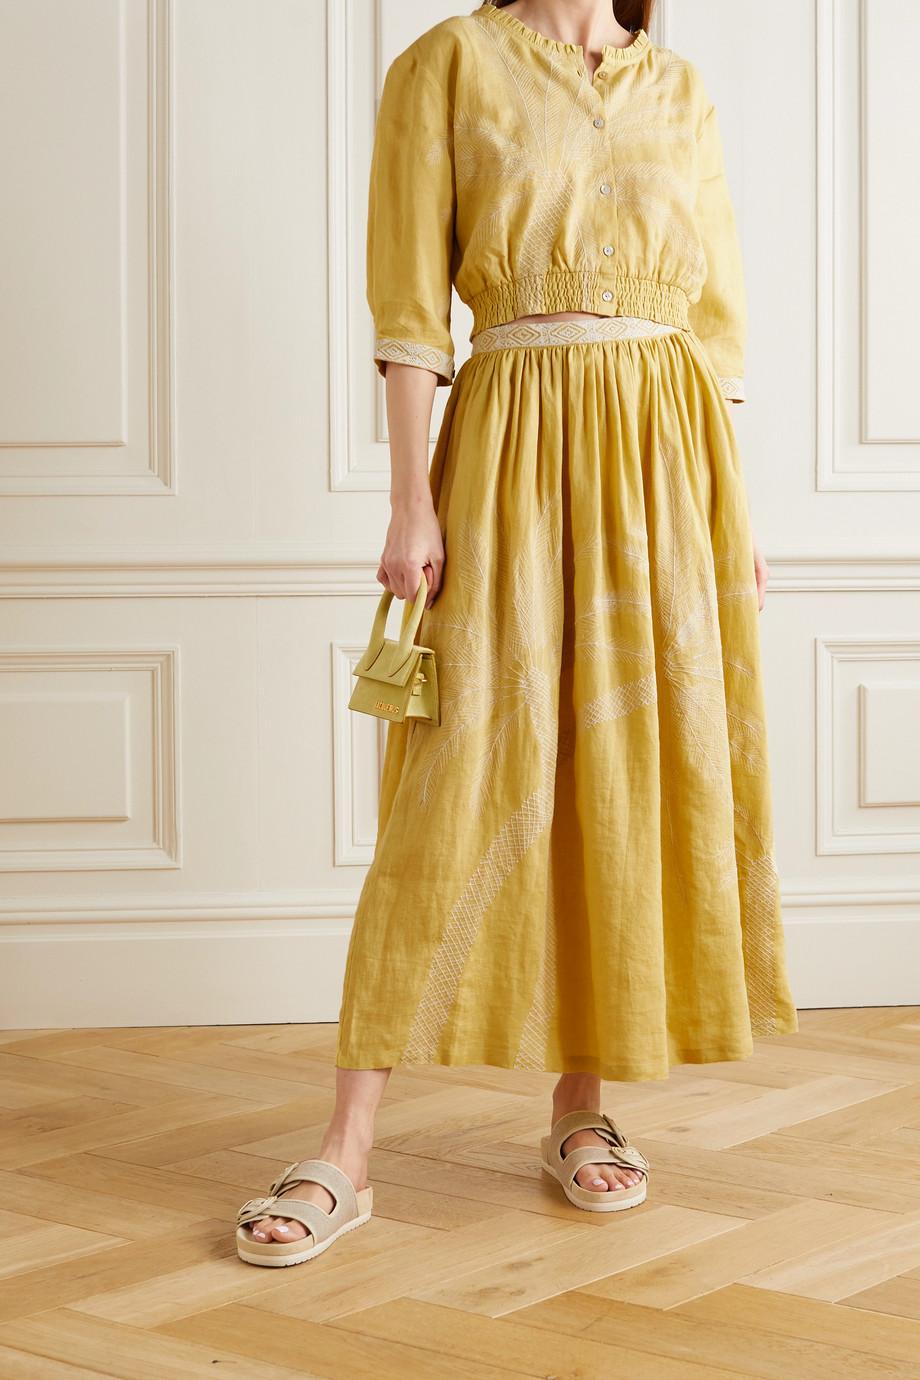 Le Sirenuse Positano Rosei ruffled embroidered linen top